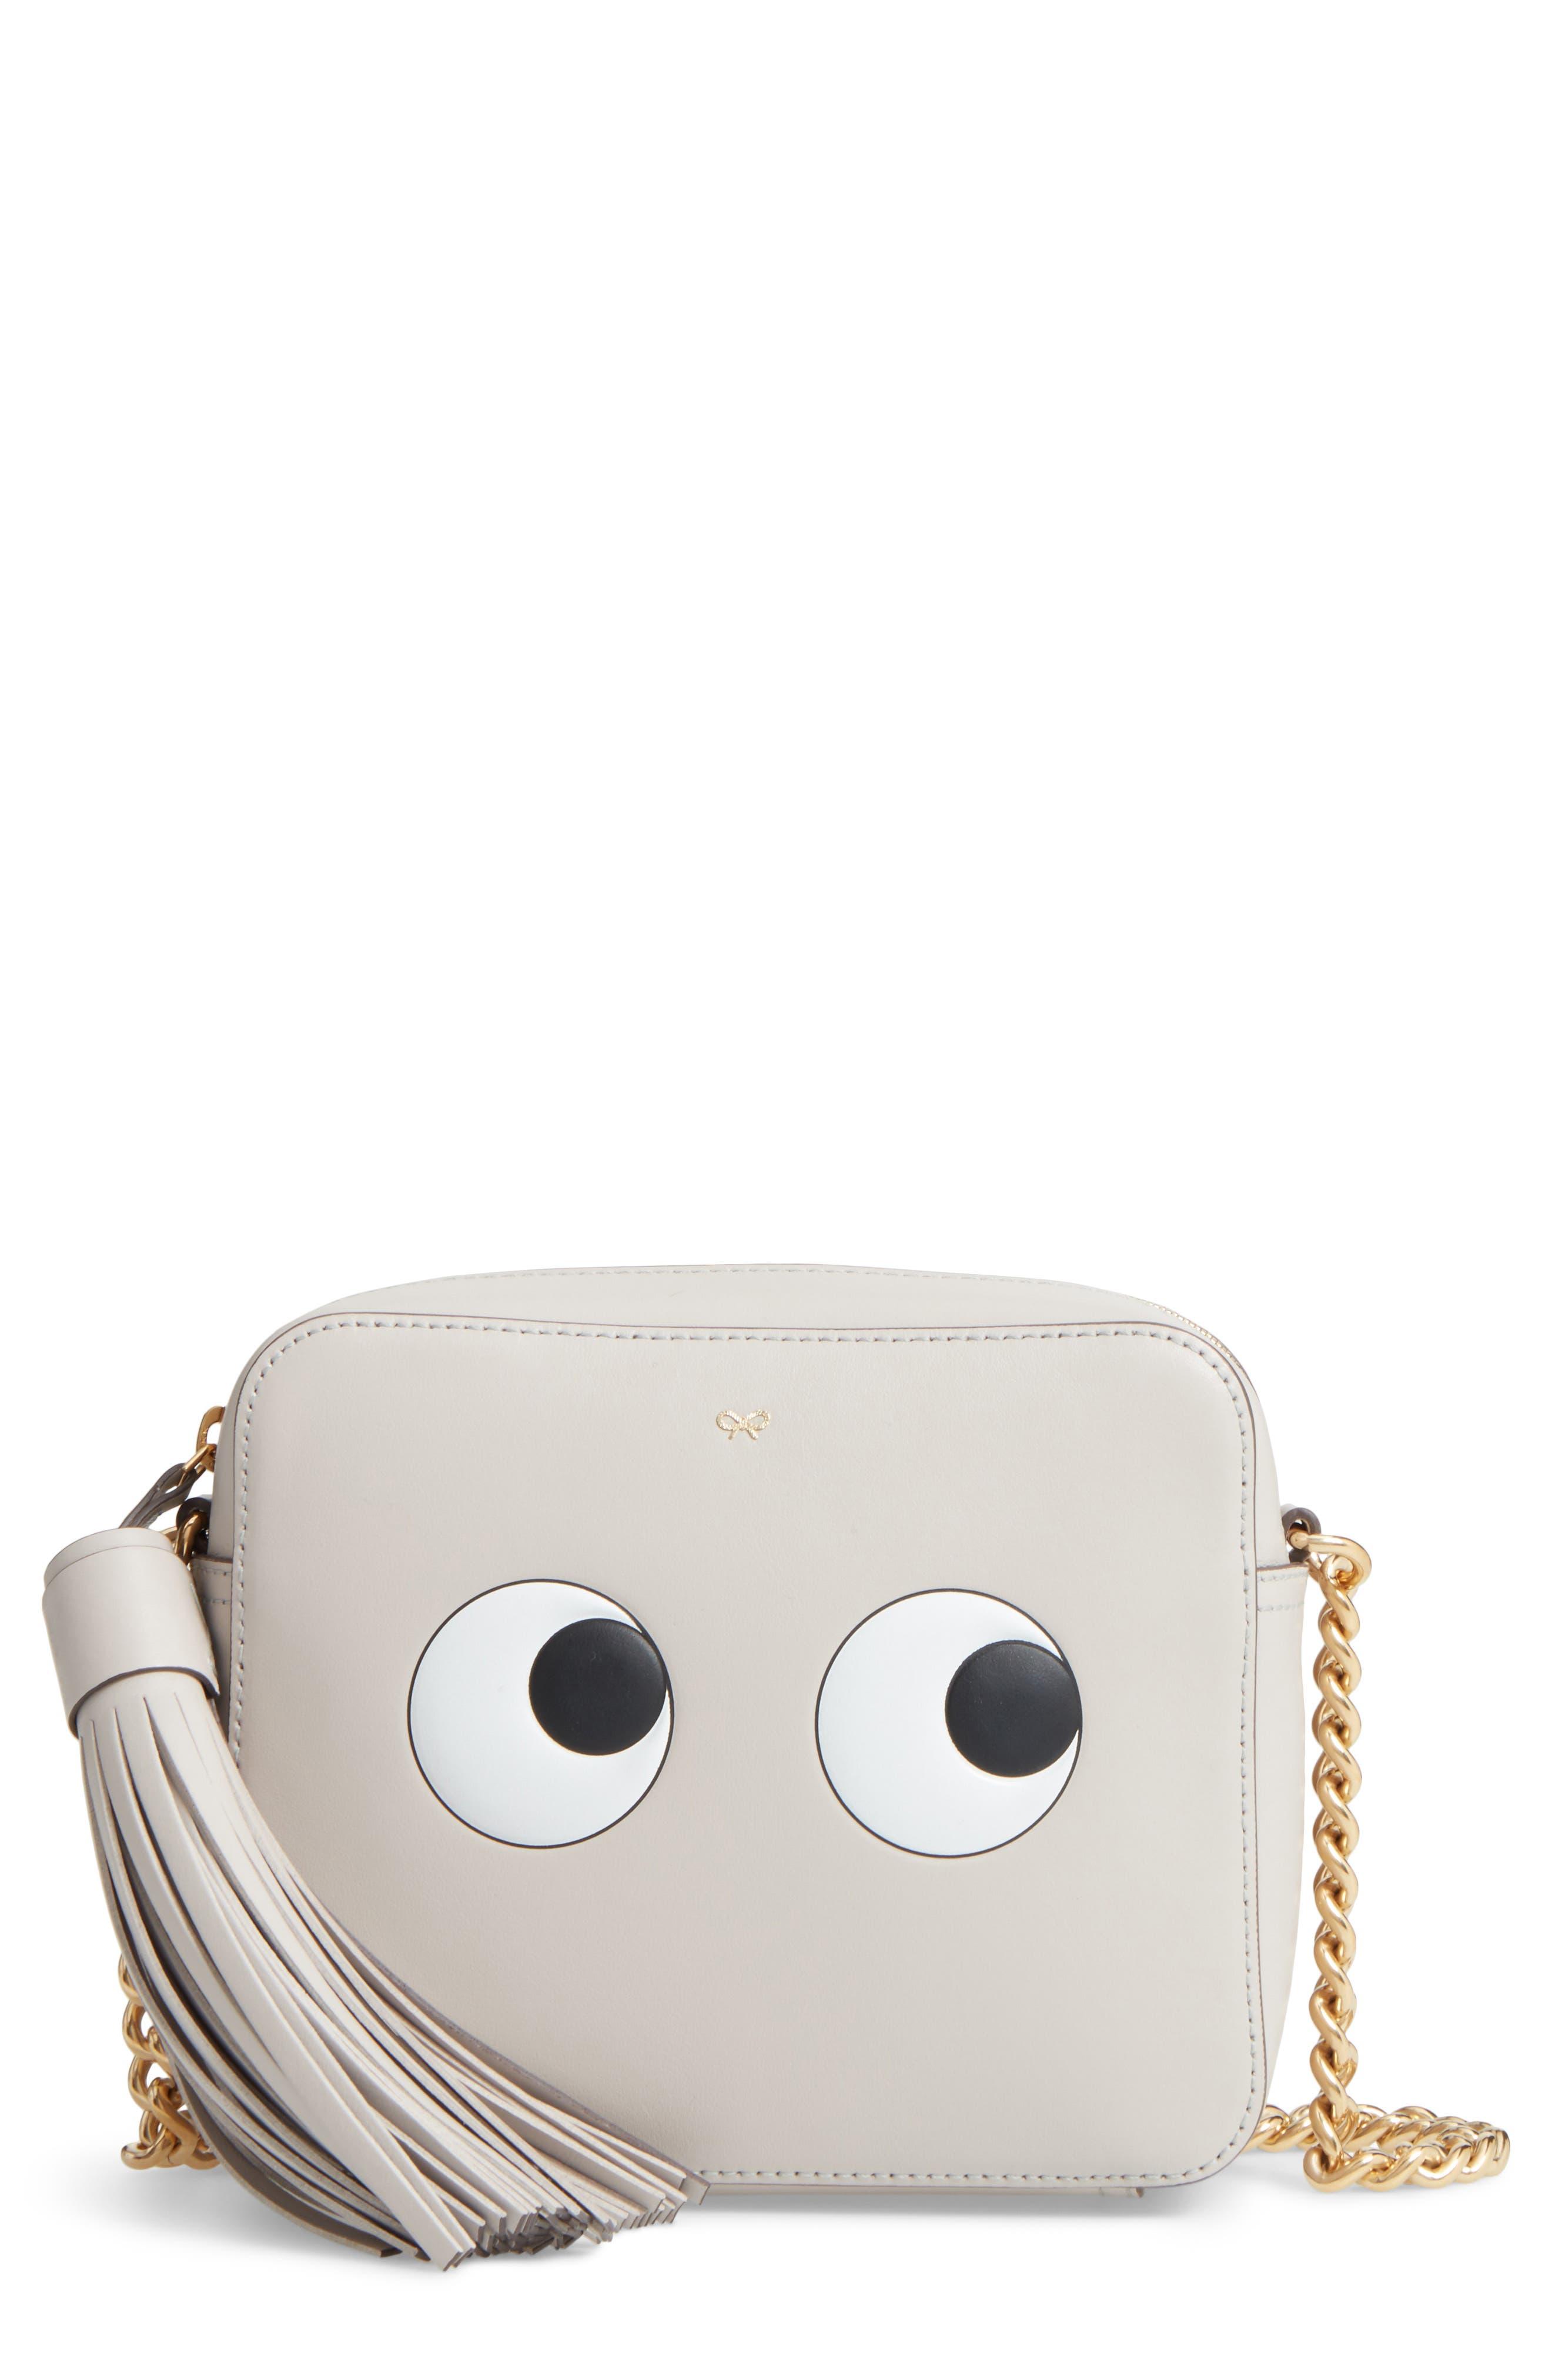 ANYA HINDMARCH Eyes Leather Crossbody Bag, Main, color, 050